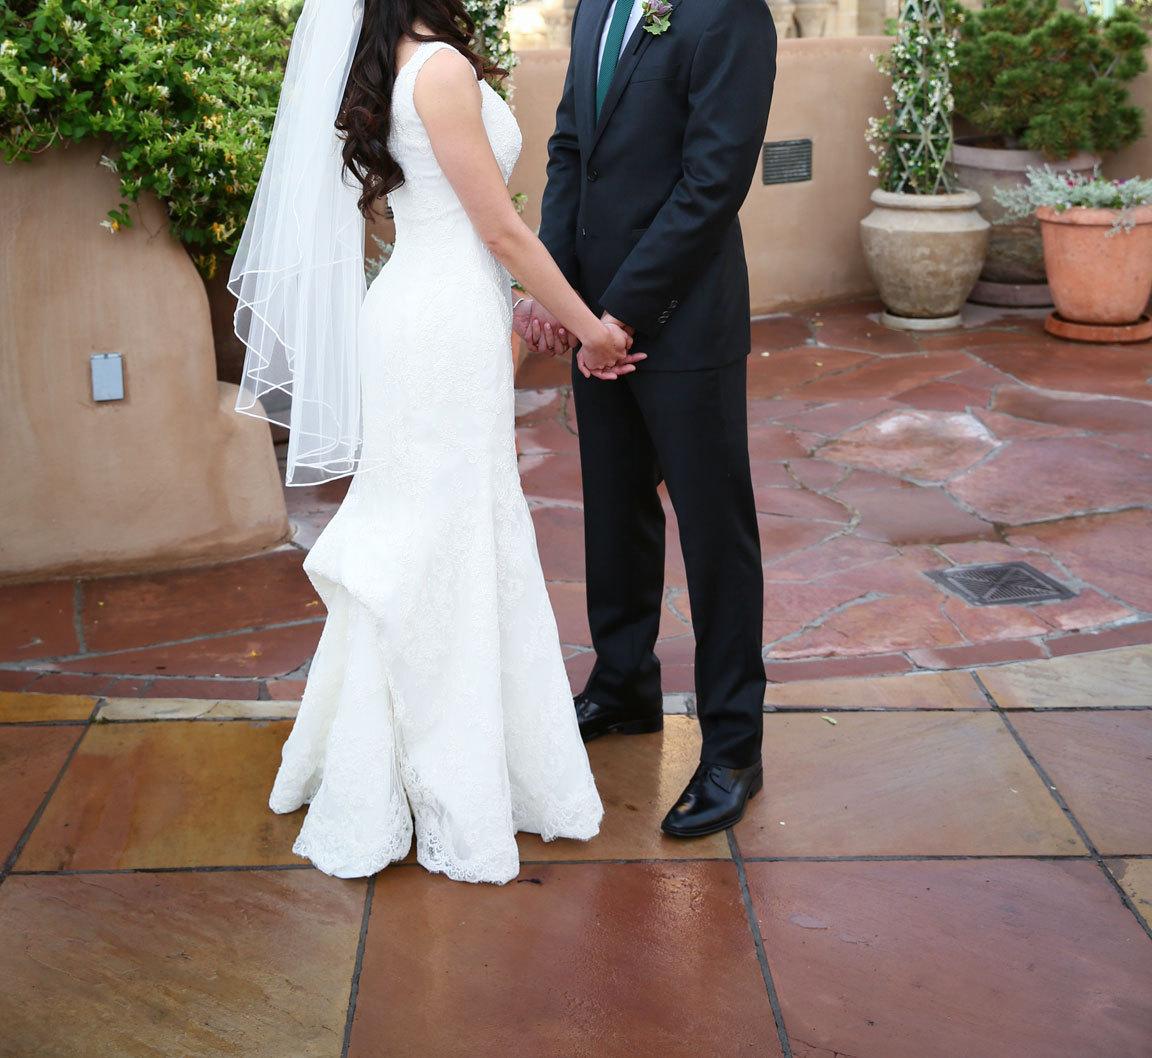 BLISS Monique Lhuillier Embroidered Lace Trumpet Wedding Dress Size 0